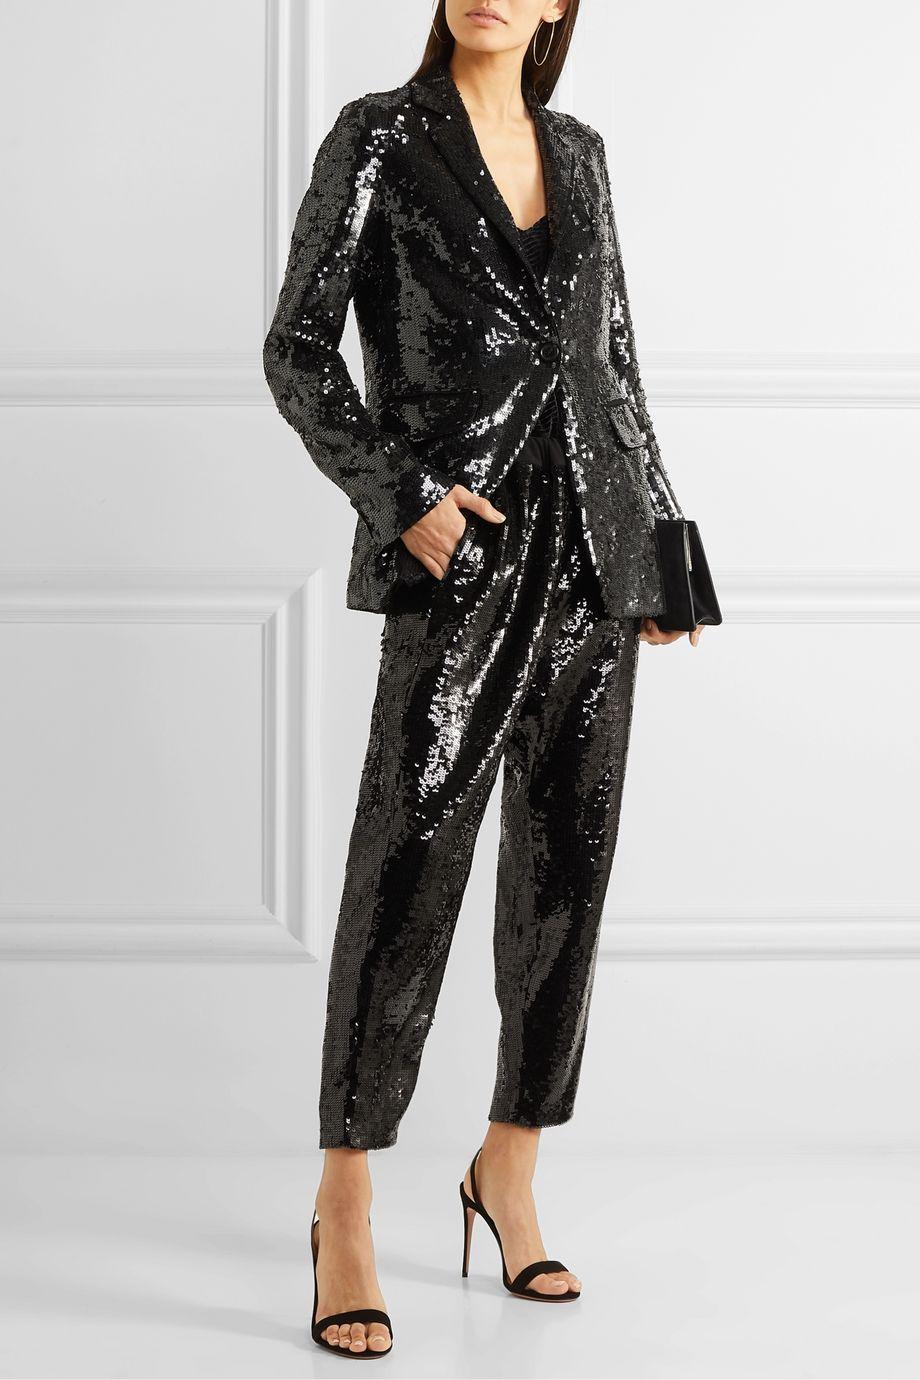 Nili Lotan Sophia sequined crepe blazer